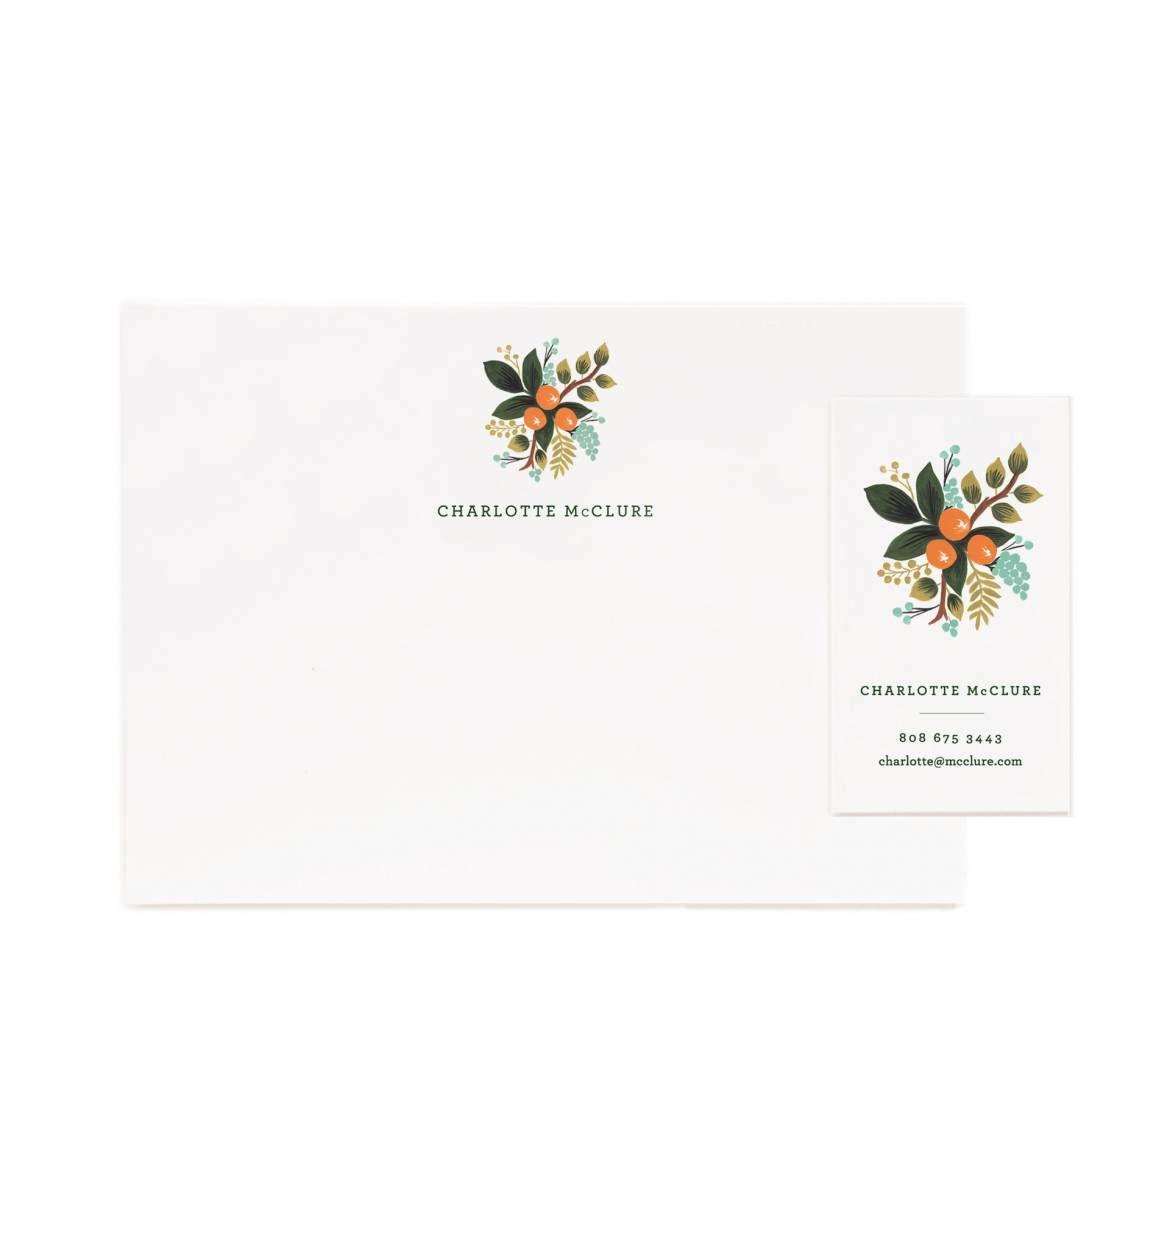 Ashampoo magical snap 4.0 | mauquidream | Pinterest | Calling cards ...